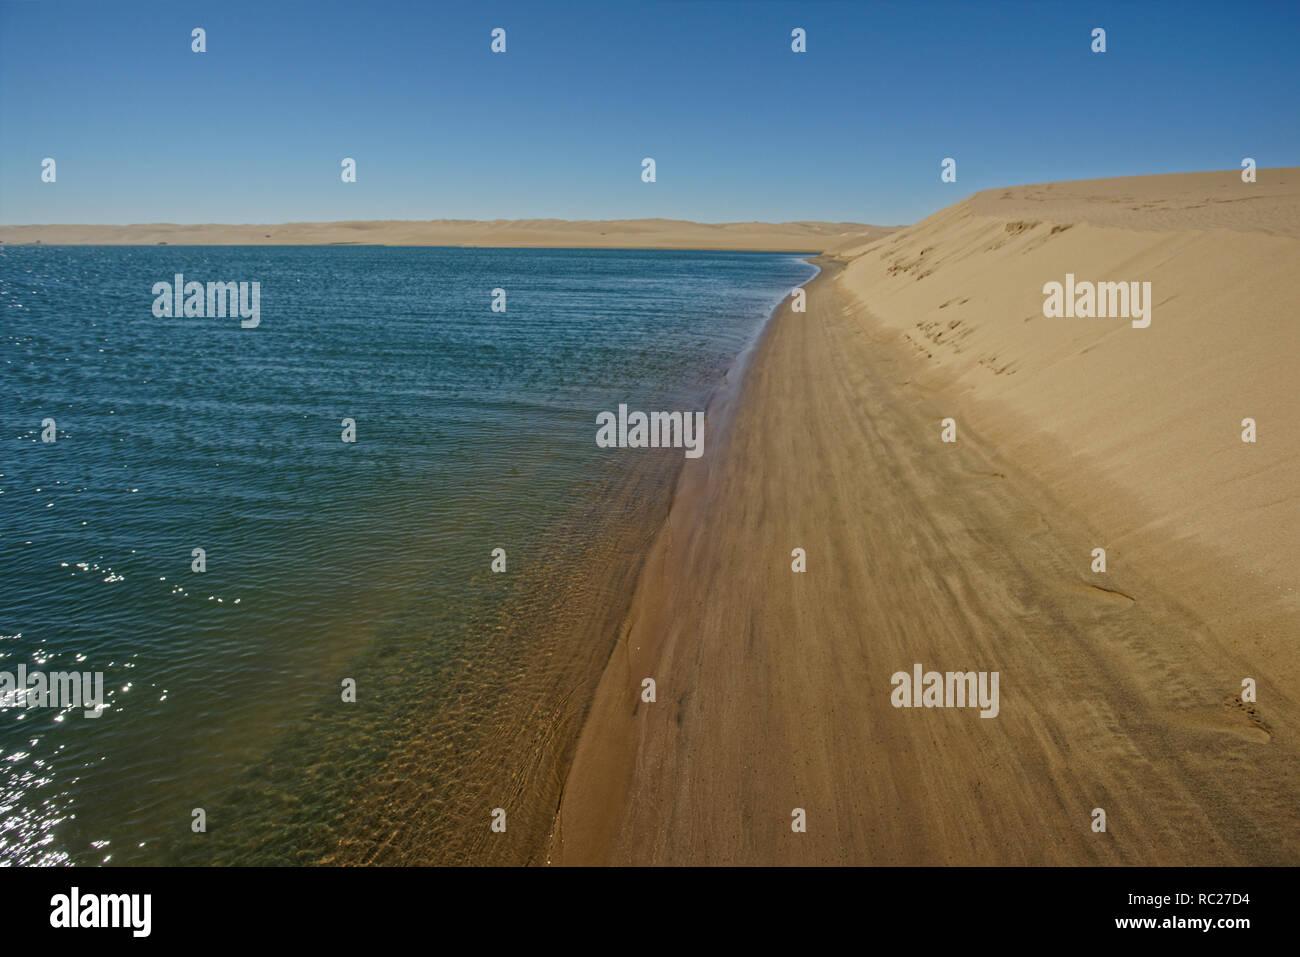 Atlantic Ocean meets the desert of the Skeleton Coast, Namibia, Africa. Stock Photo